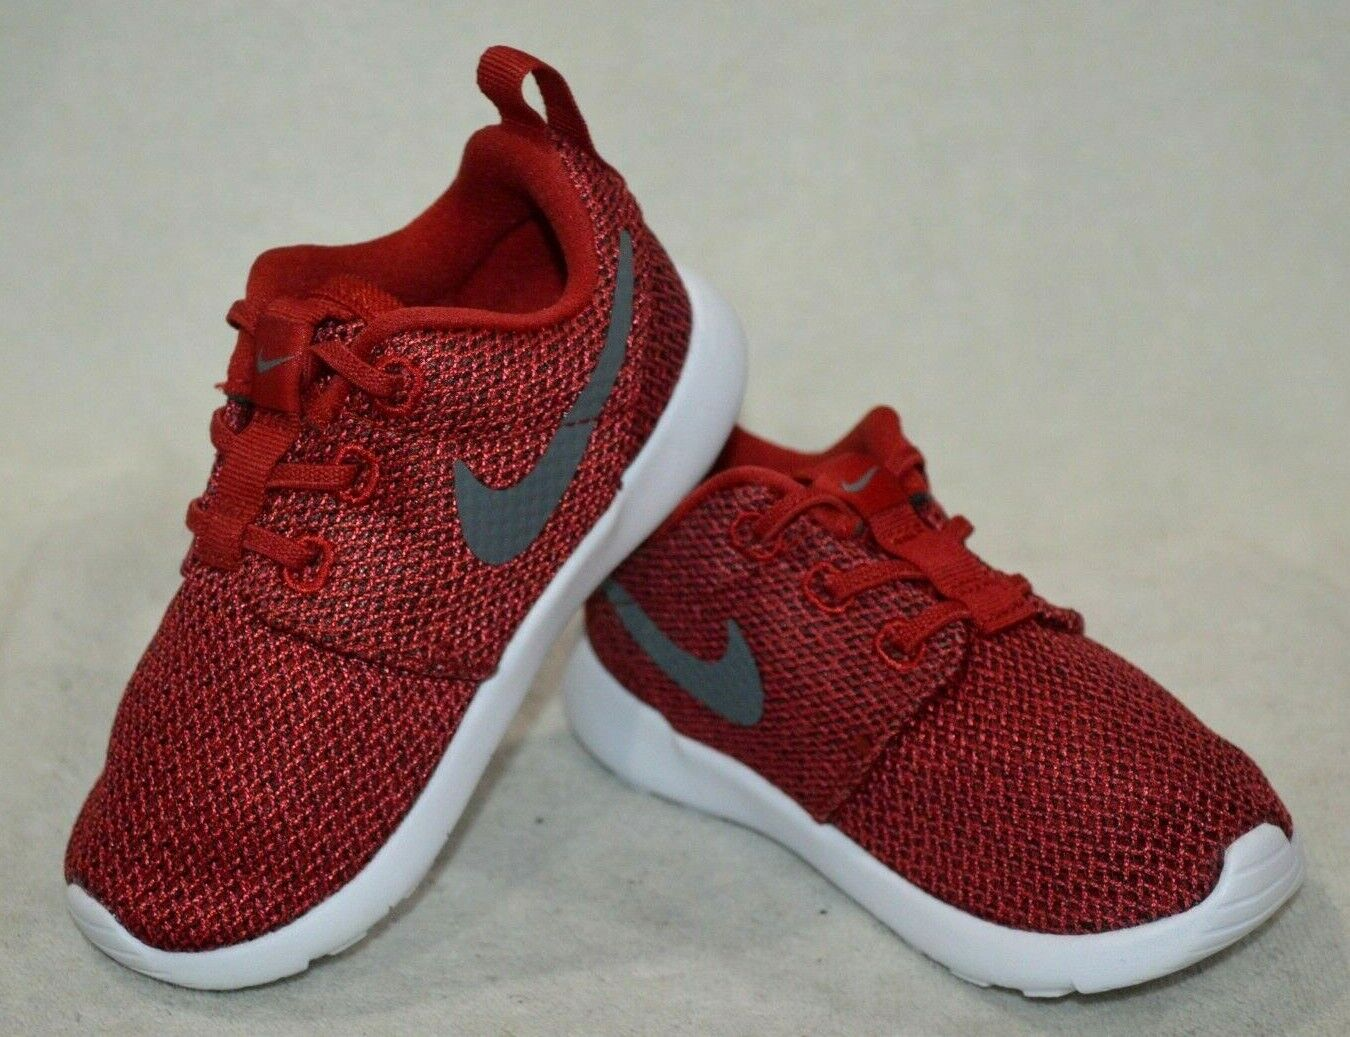 Nike Roshe One TDV Nike Roshe One (TDV) Red/Grey/Anthracite Toddler Boy's Shoes-Size ...